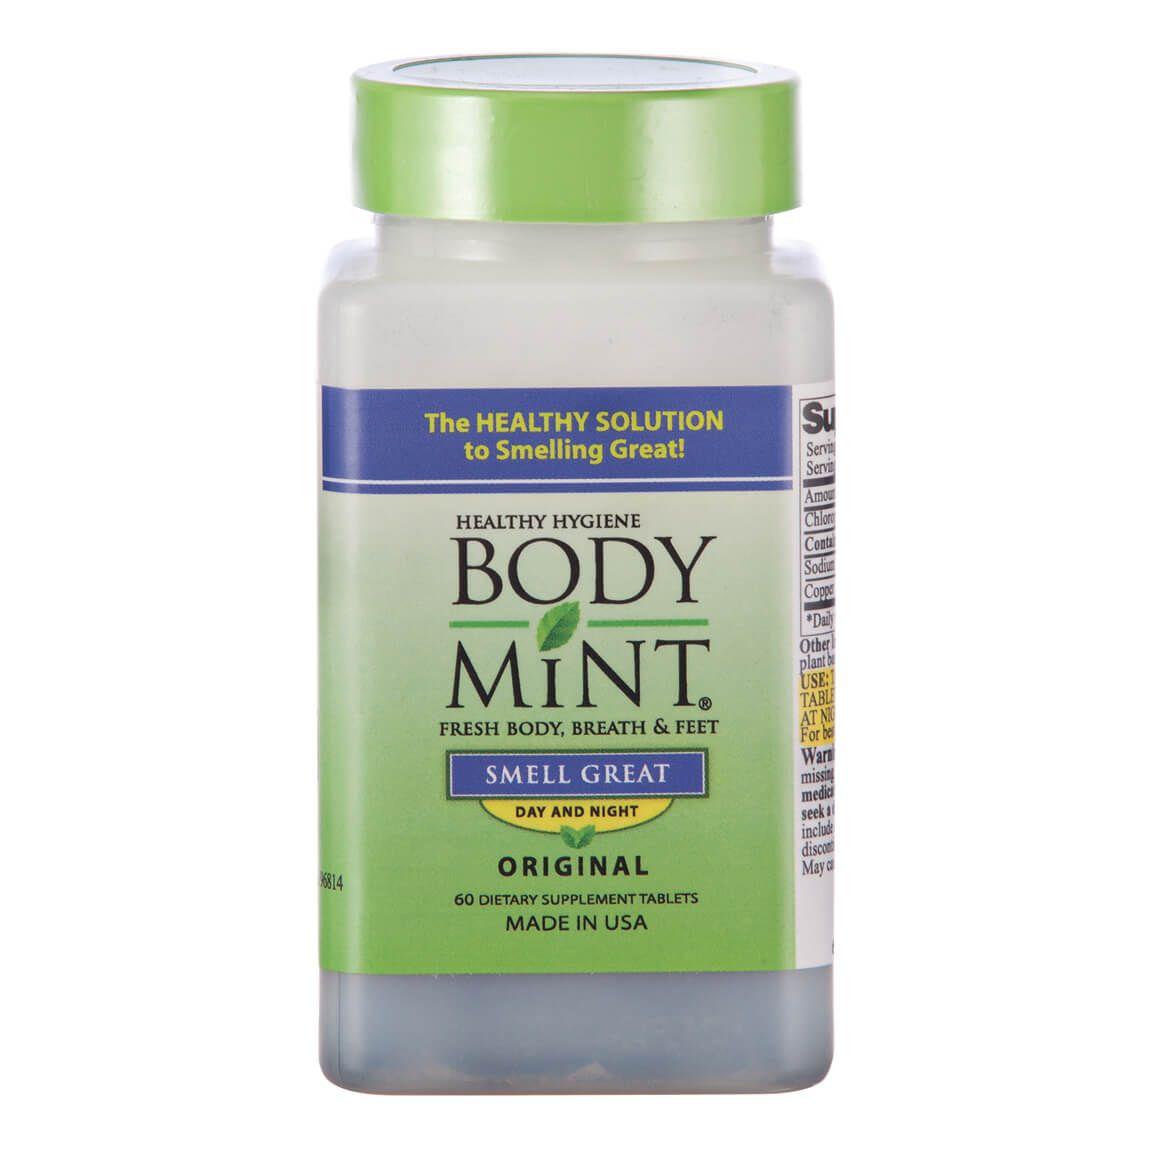 Body Mint® Body Odor Pill - 60 Tablets-303425